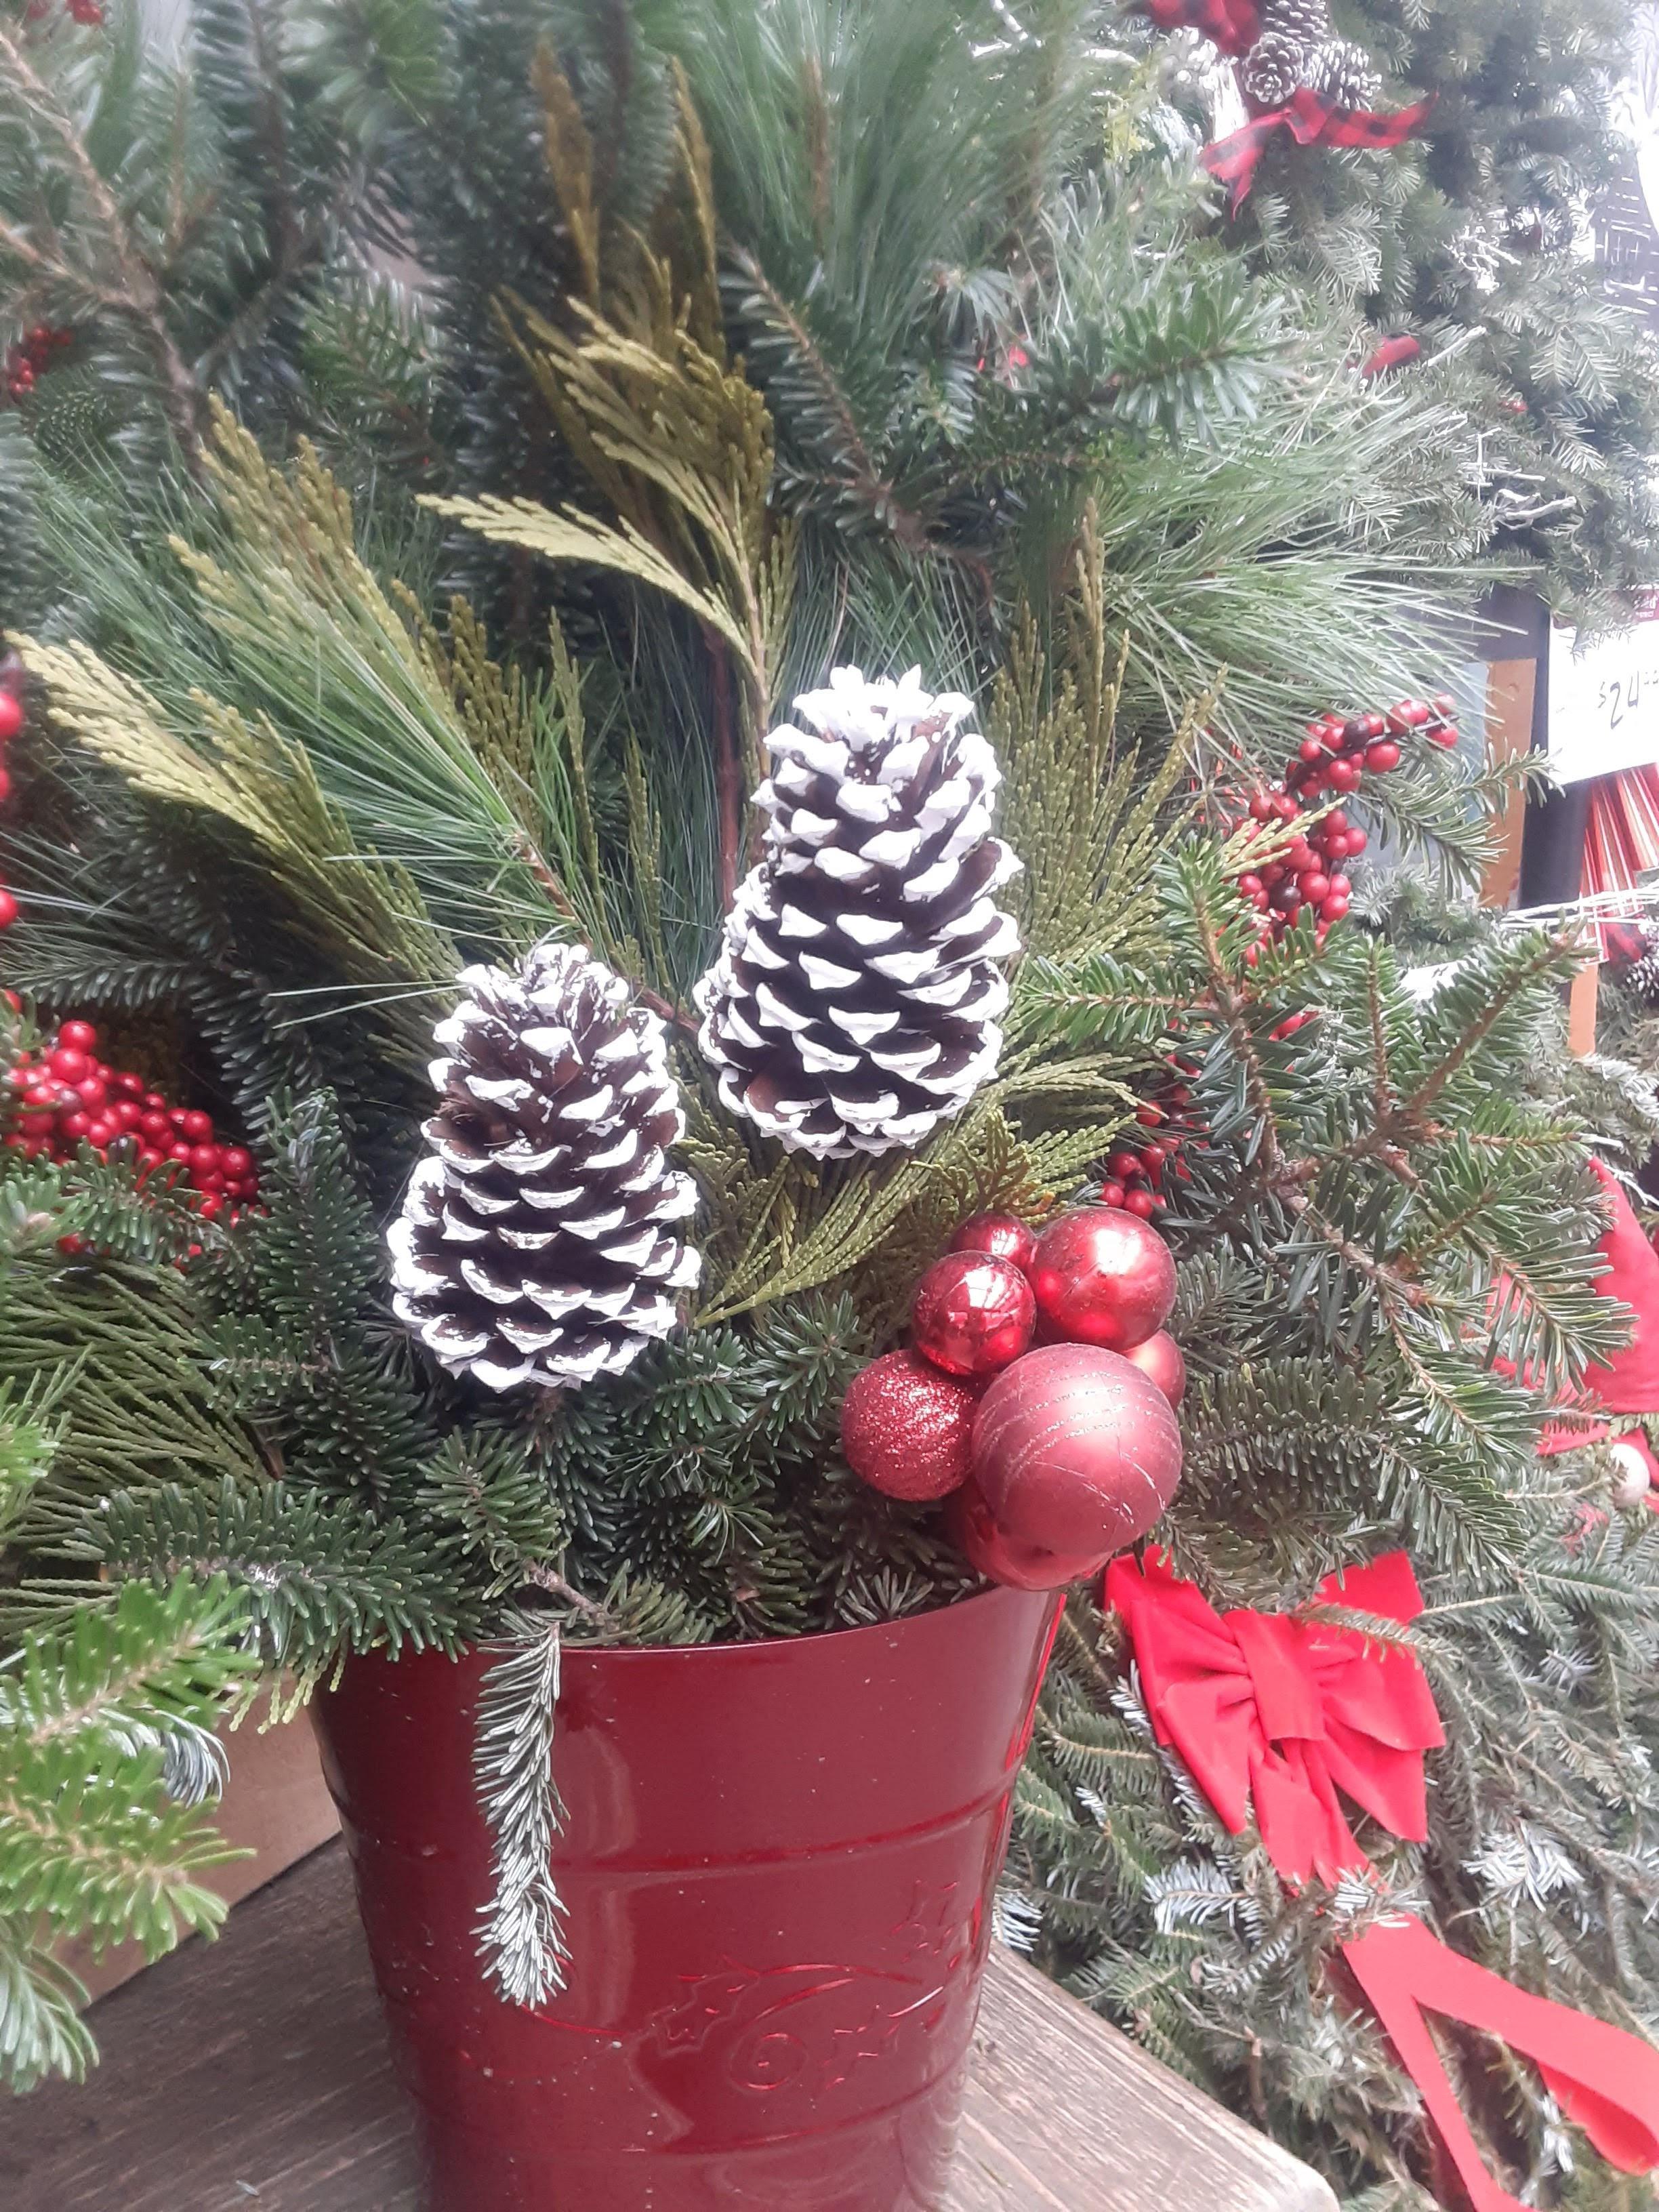 Festive Fowl Holiday with Soulful Santa